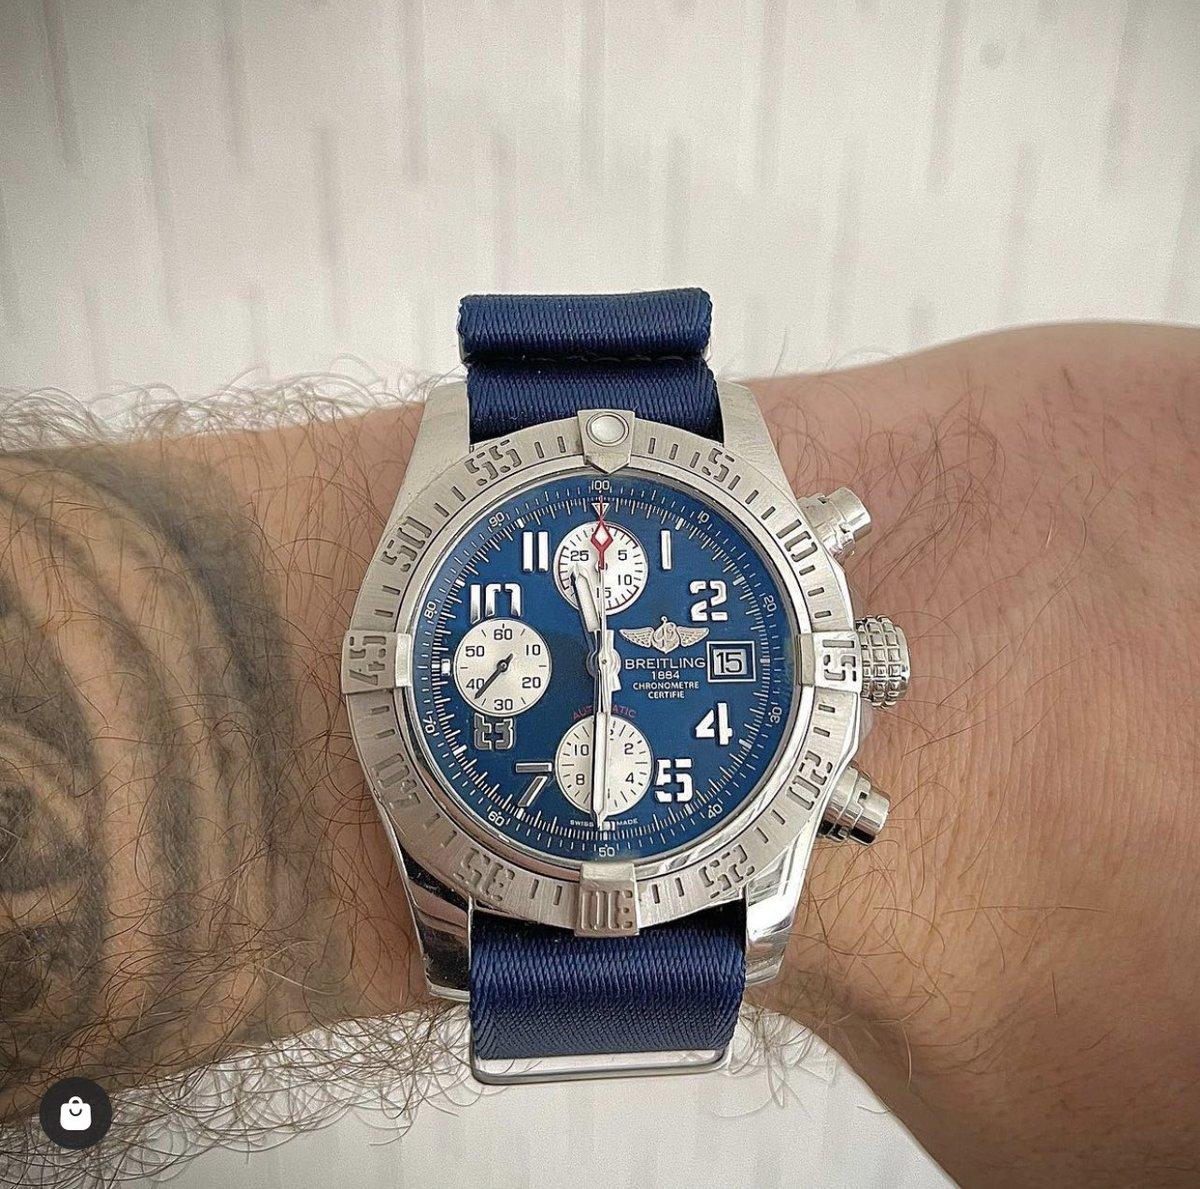 Monday wrist shot featuring our Hudson NATO watch strap 👌  #nato #natostrap #breitling #wristshot https://t.co/iE4QXToIWl